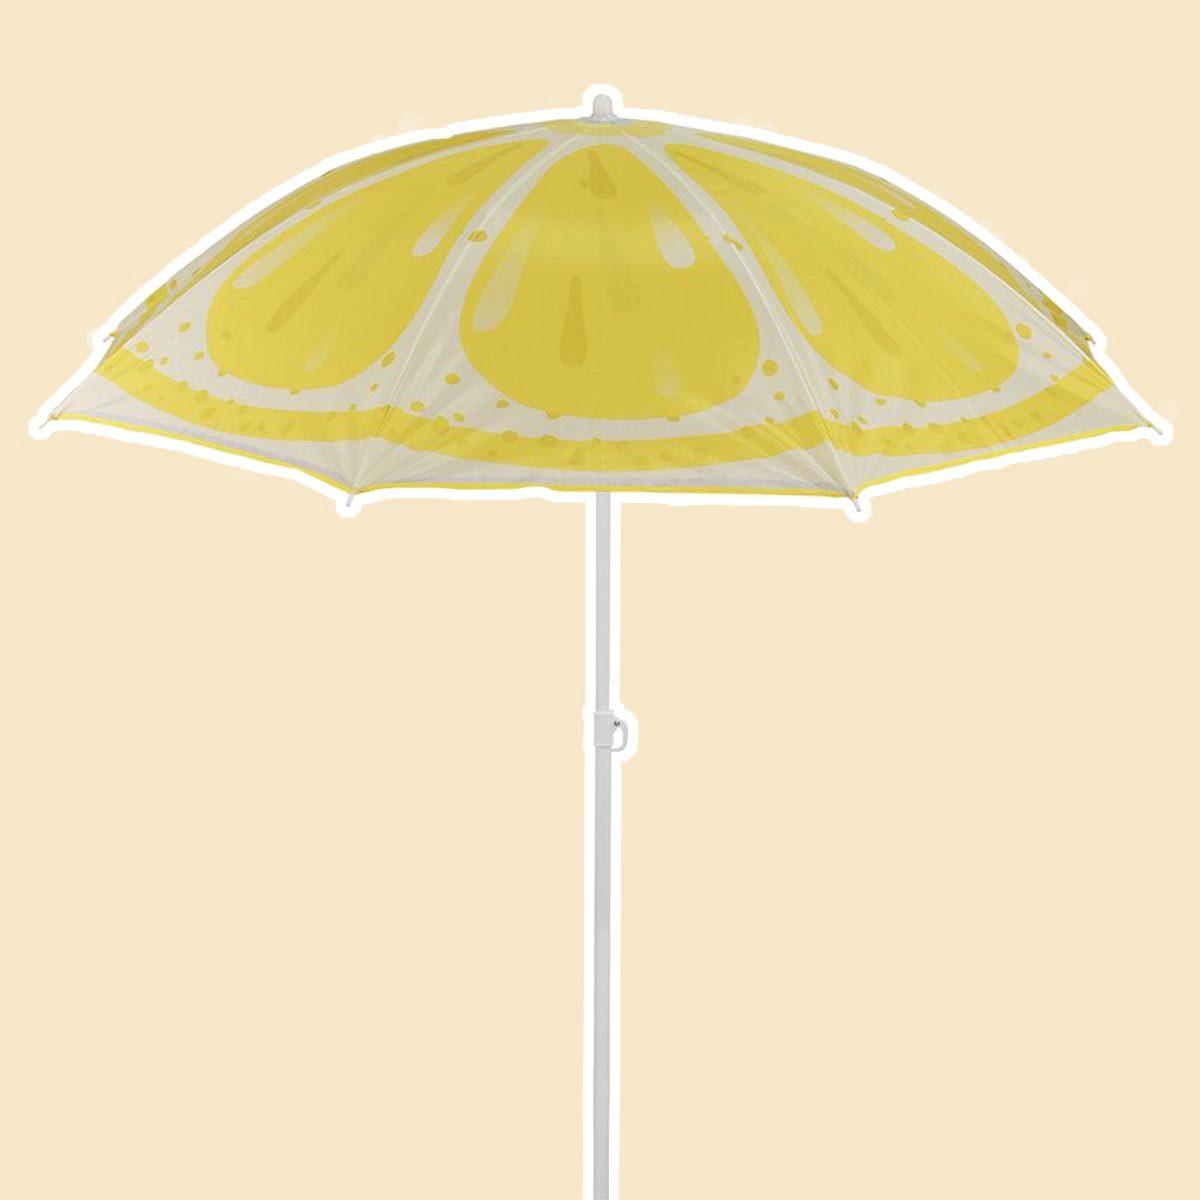 Lemay 5' Beach Umbrella